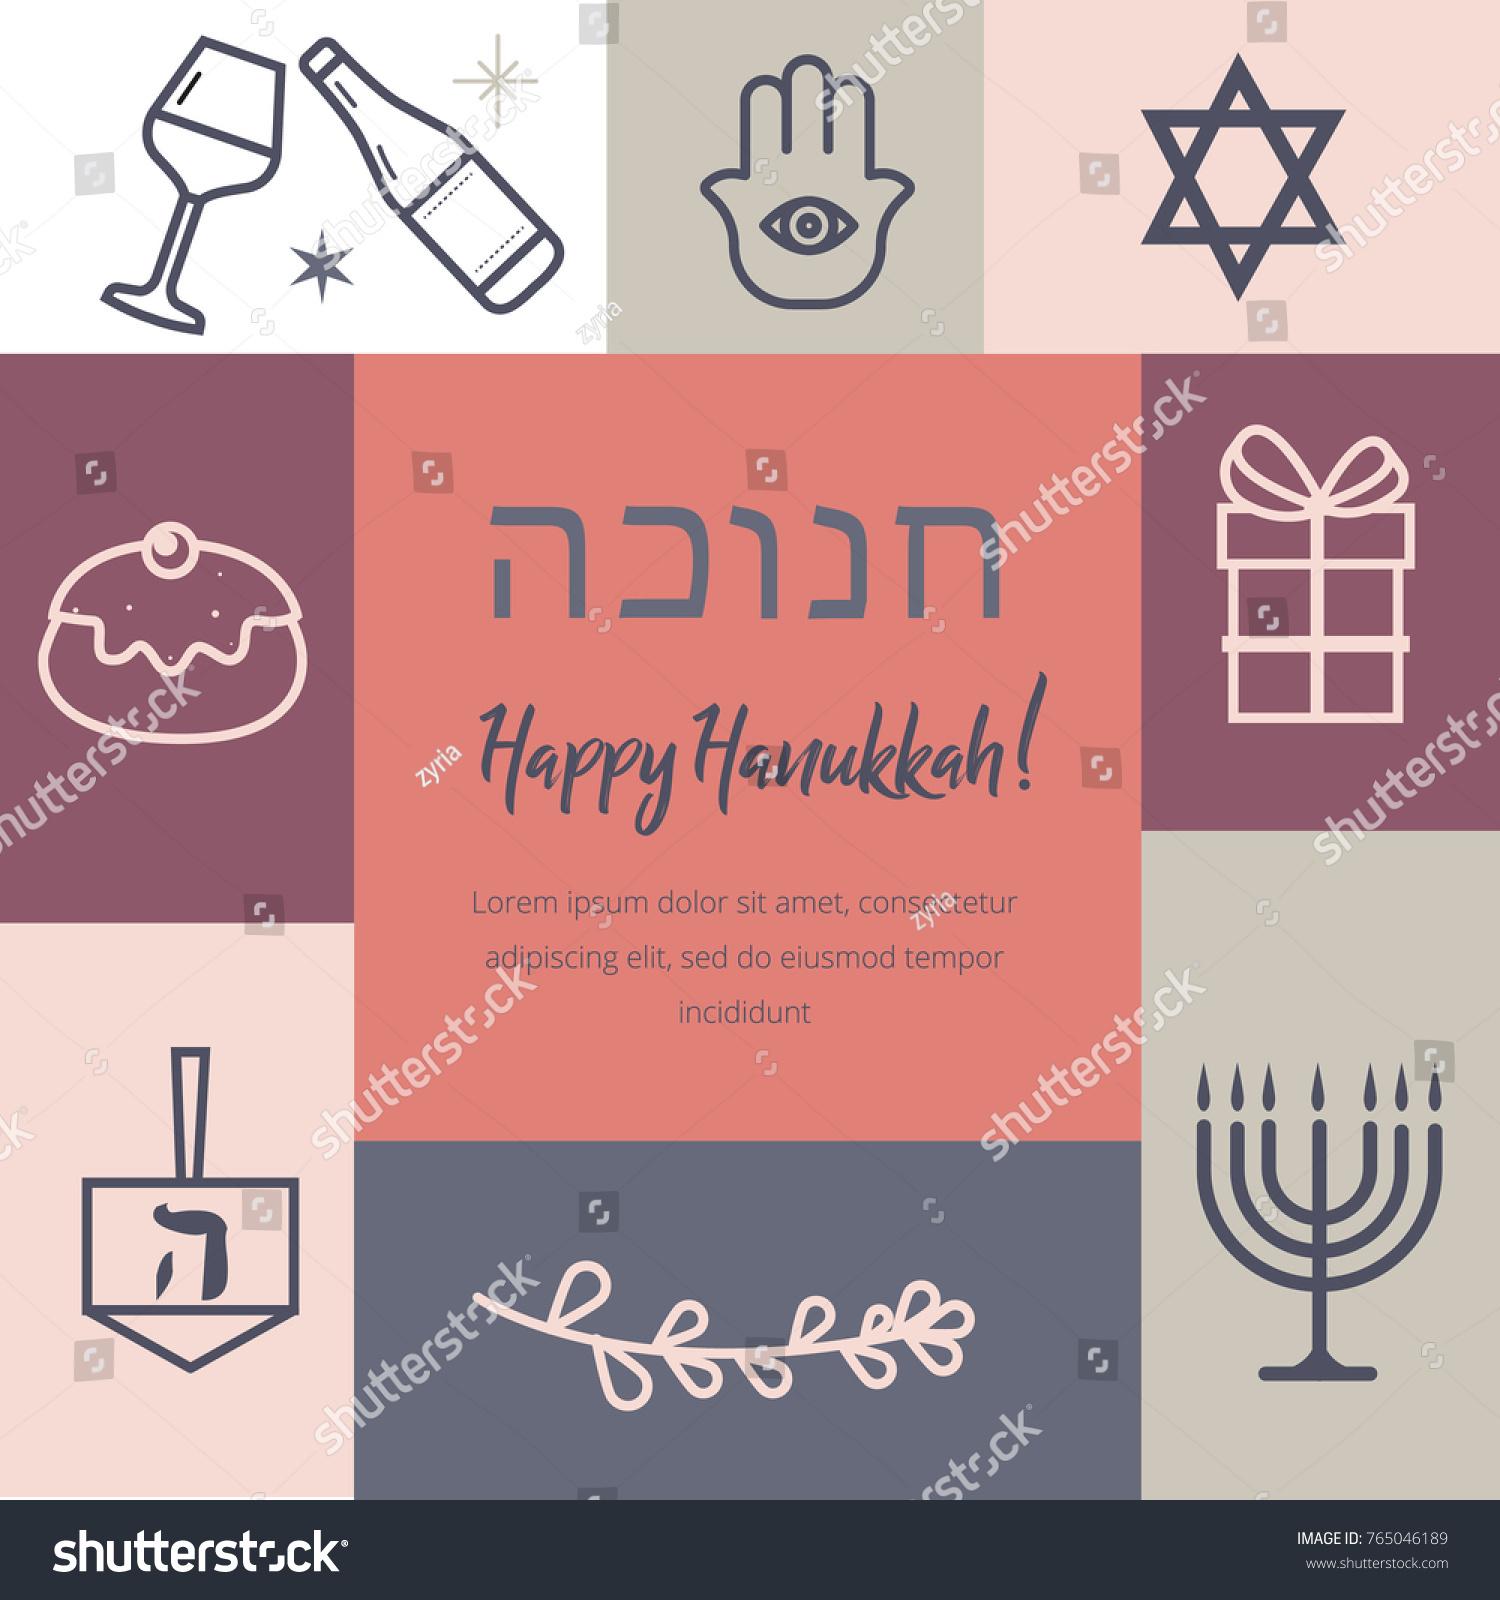 Jewish holiday hanukkah greeting card traditional stock vector jewish holiday hanukkah greeting card traditional chanukah symbols wooden dreidels spinning top biocorpaavc